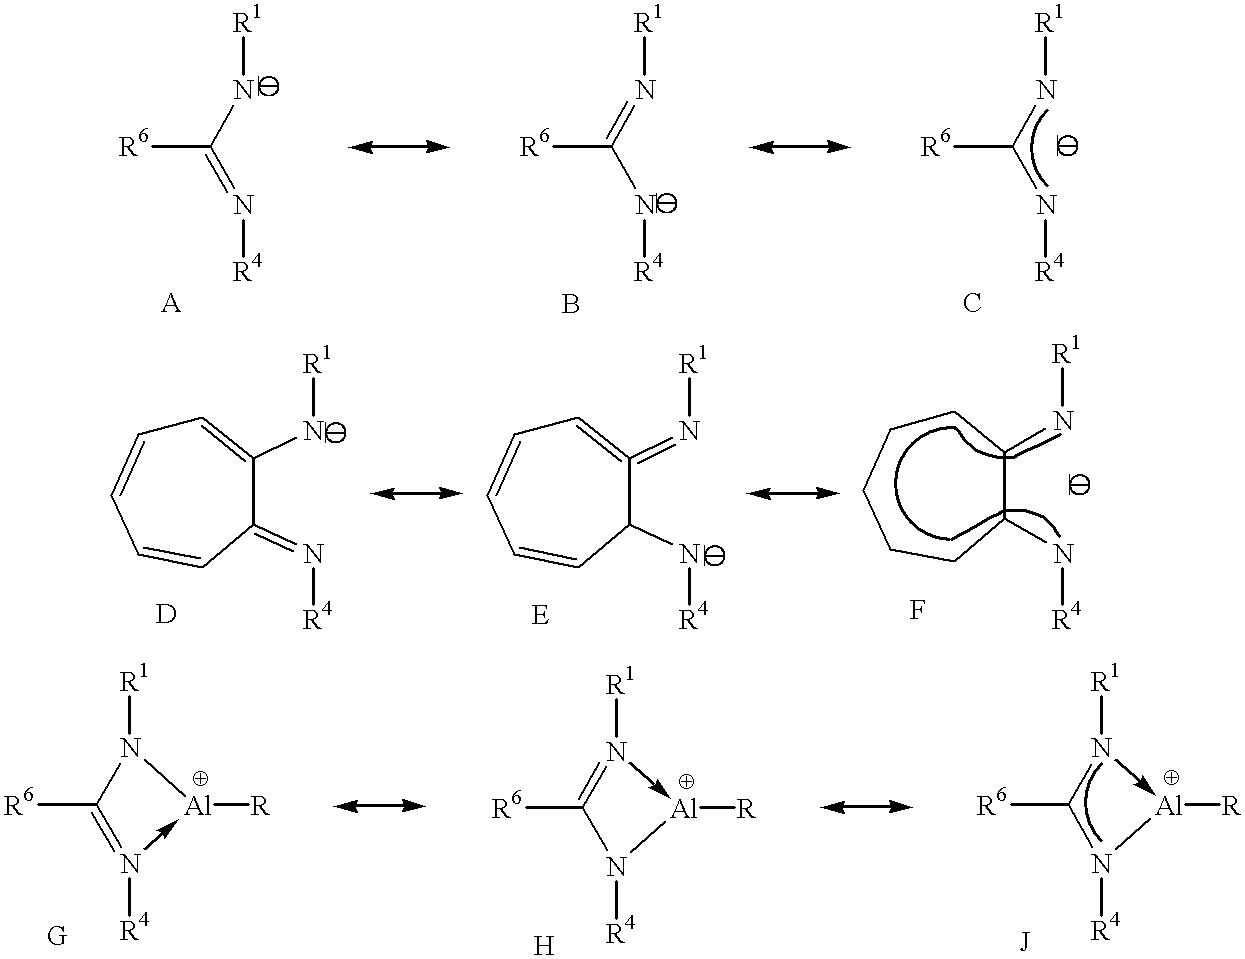 Pentane Formula Structure amp Uses  Video amp Lesson